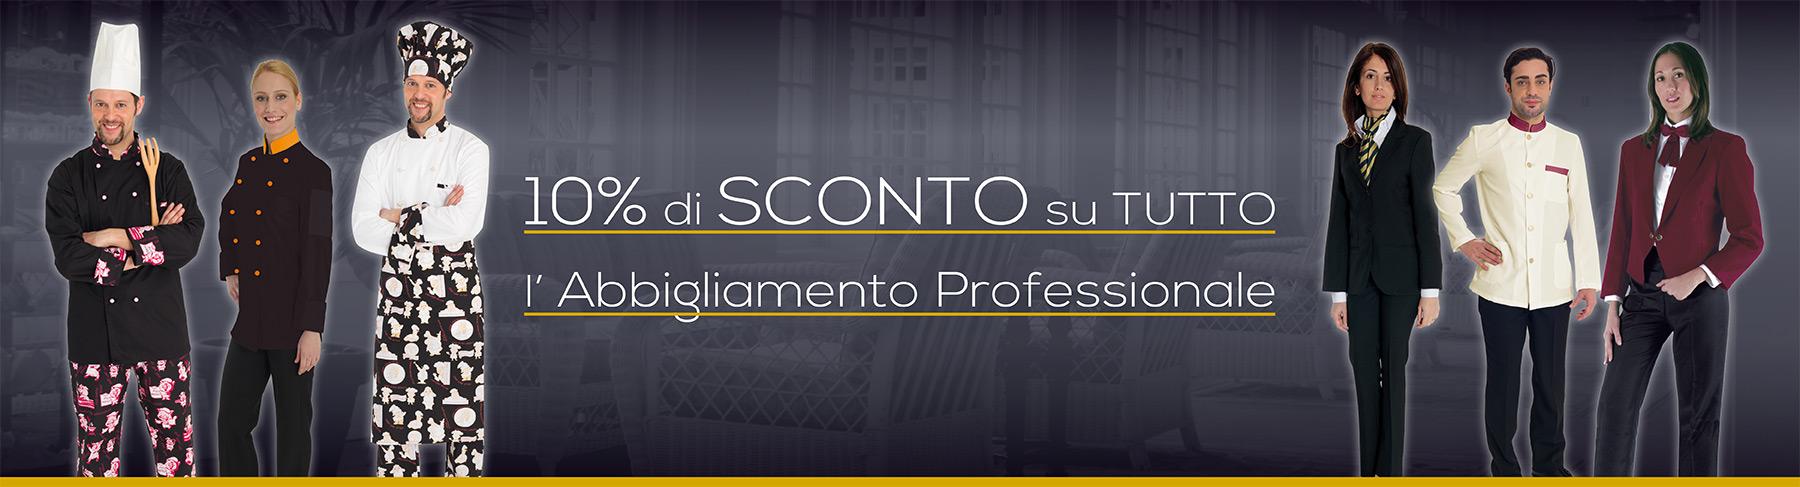 slide2_sconto_10